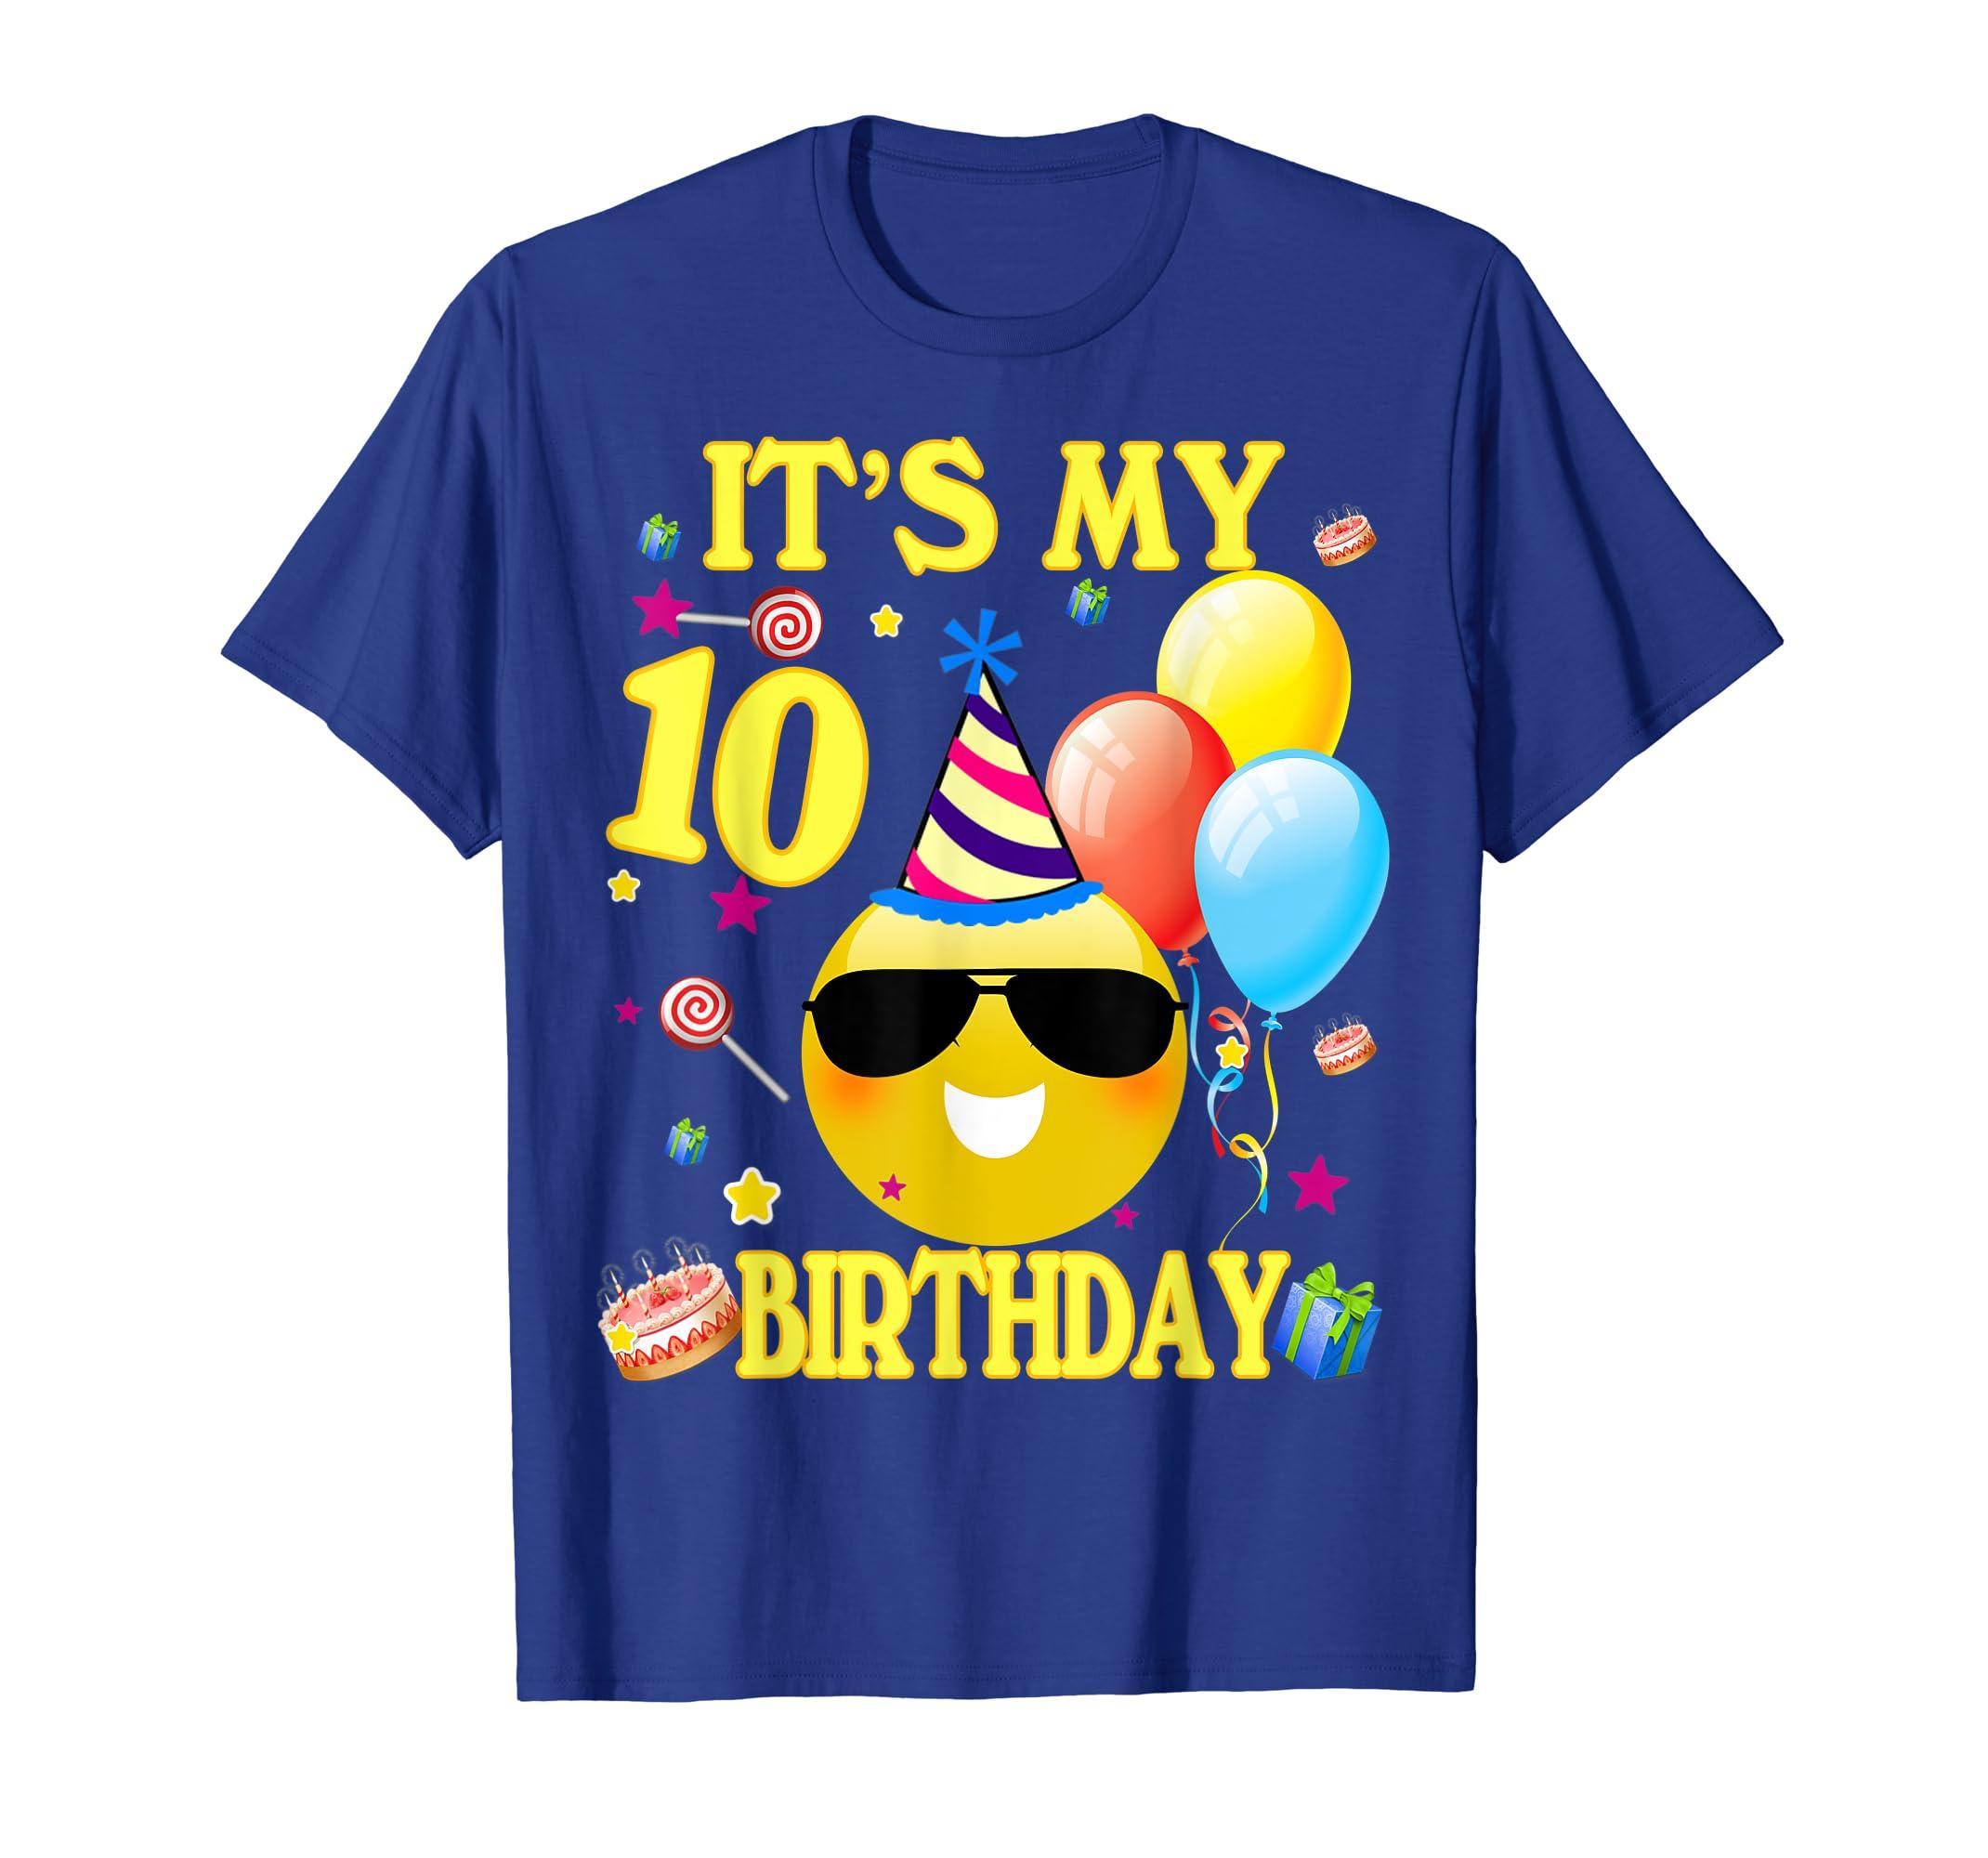 Amazon 10 Birthday Boy Shirt Years Old 10th Gift Clothing